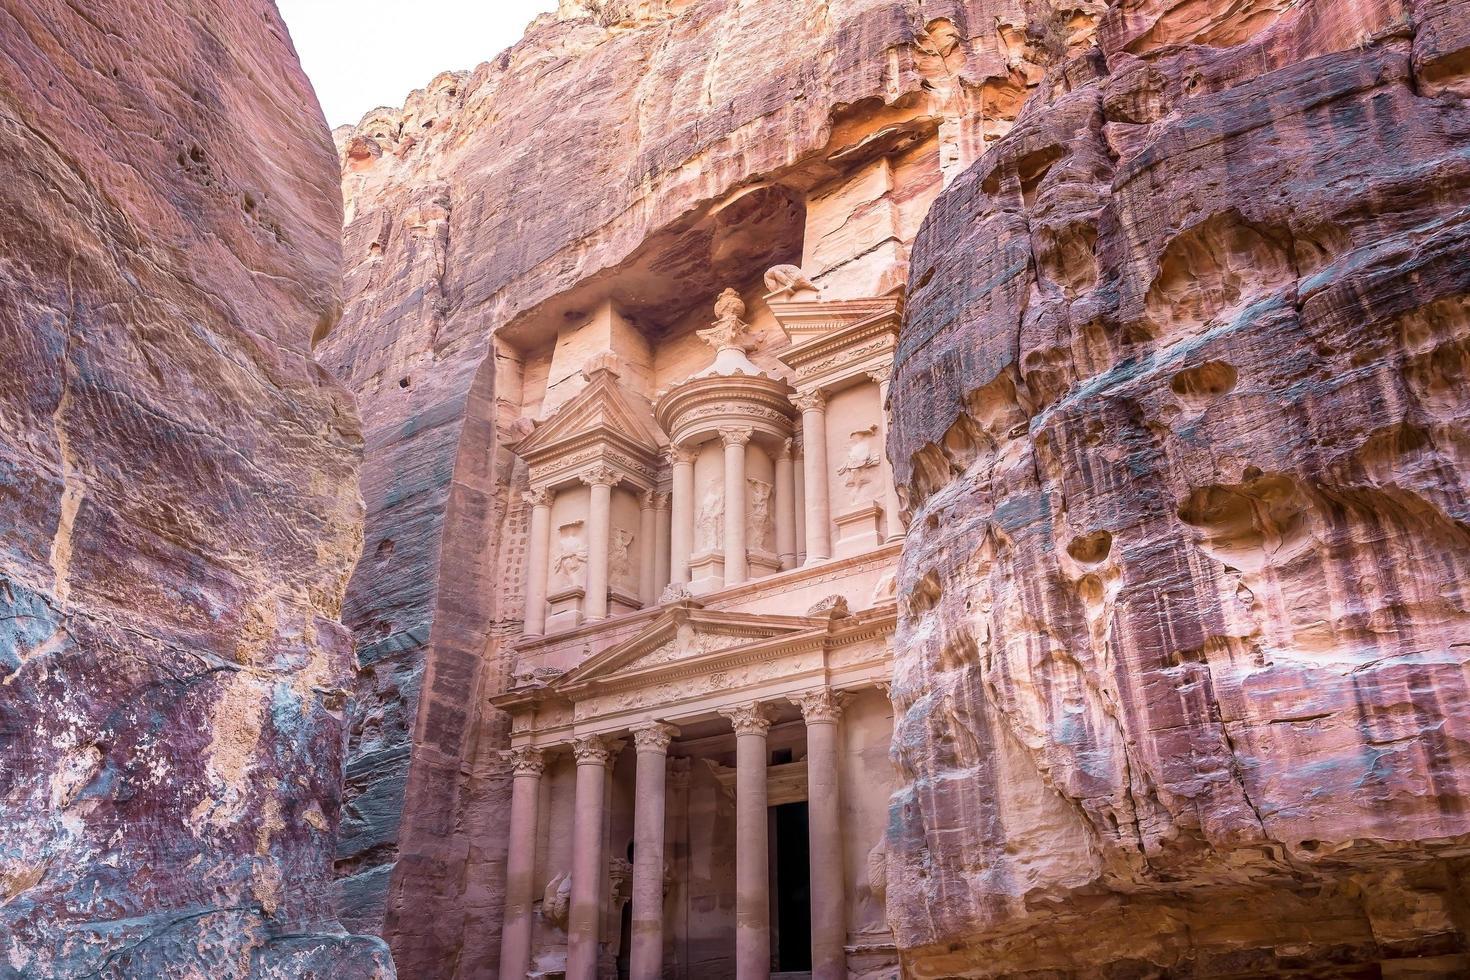 al khazneh in der antiken stadt petra, jordan foto